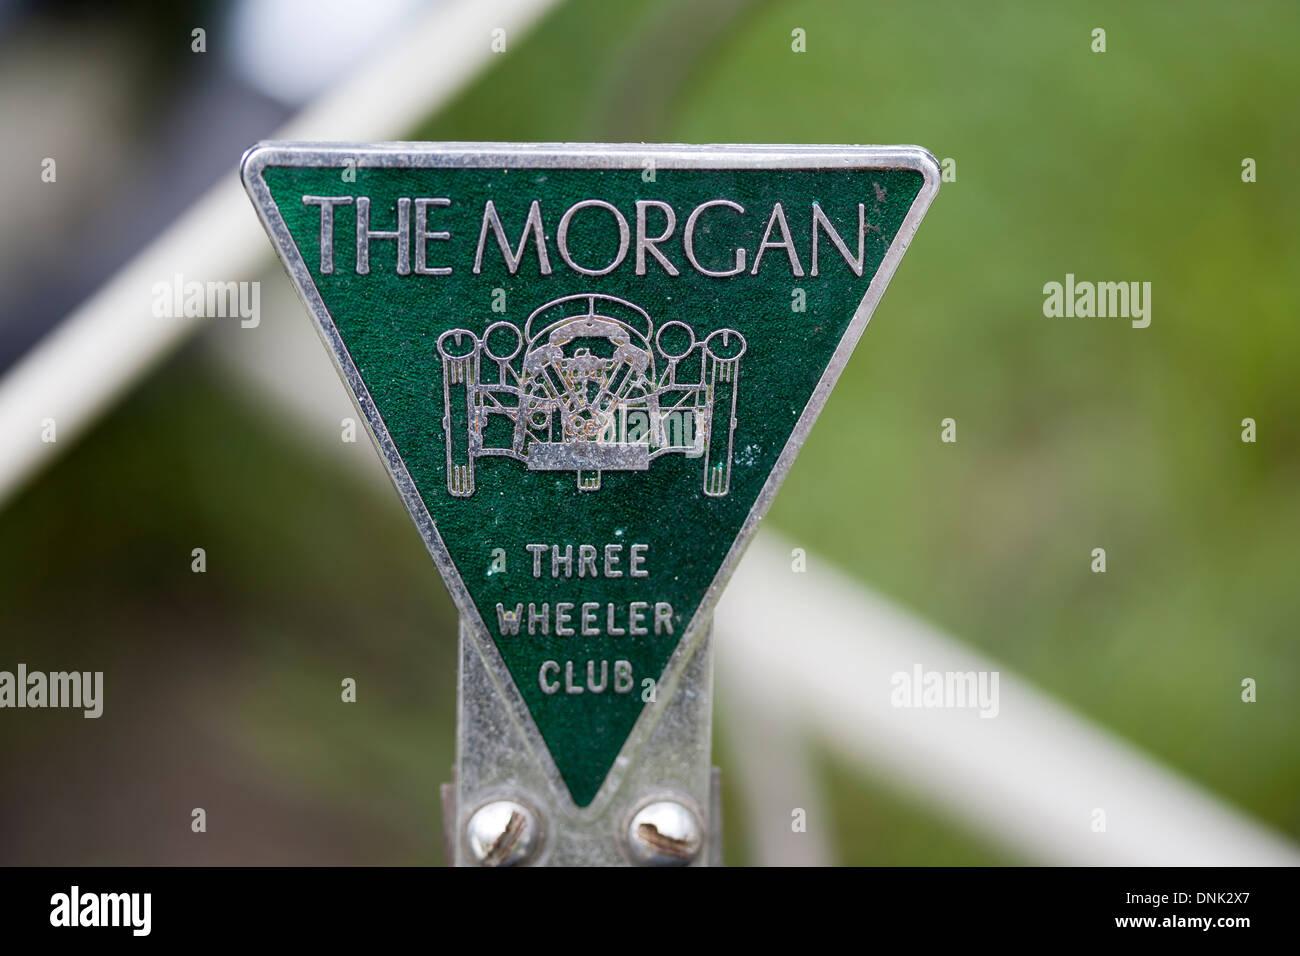 The Morgan Three Wheeler Club - Stock Image